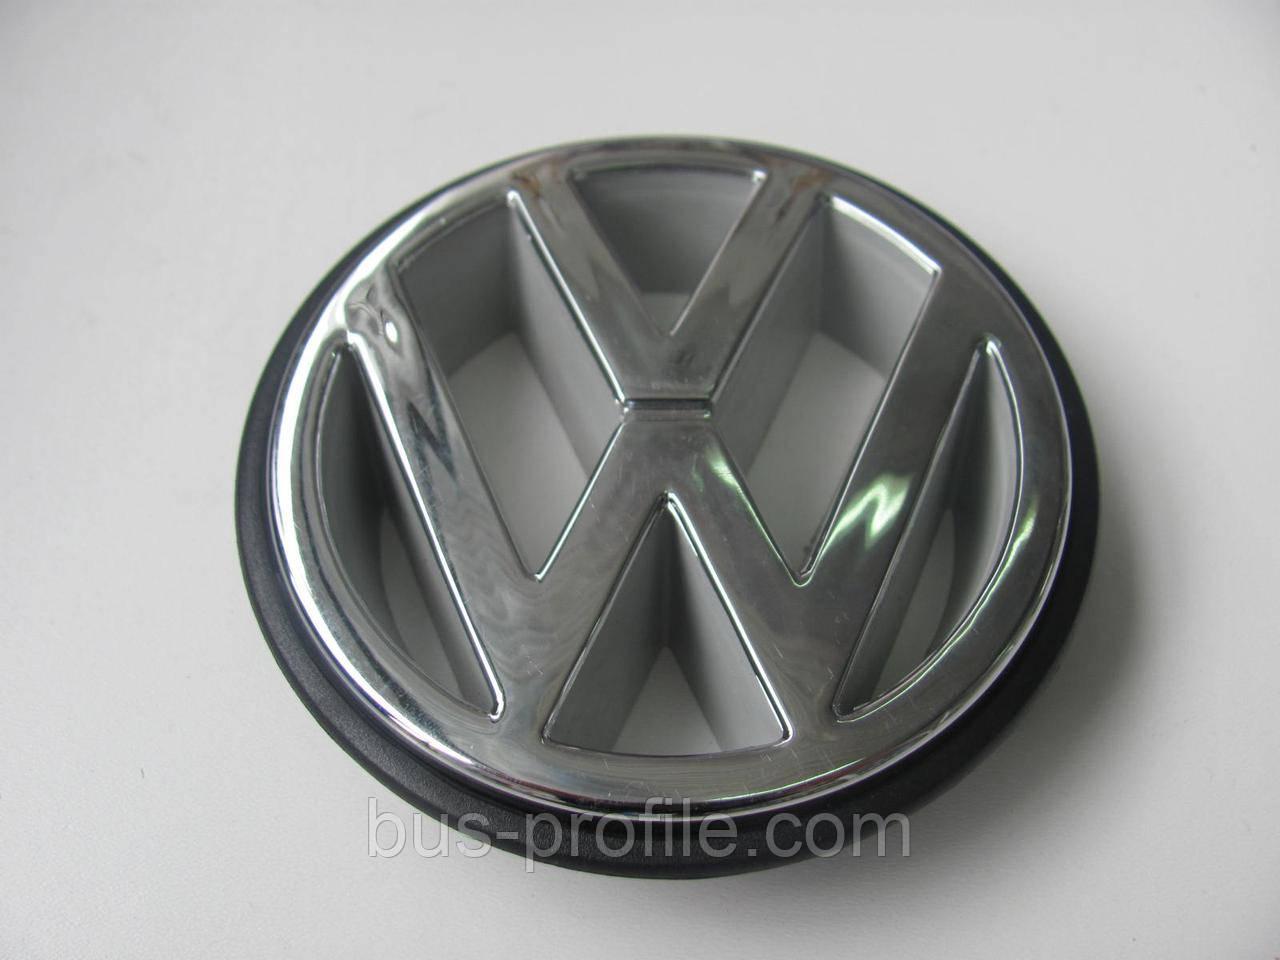 "Эмблема решетки радиатора""VW"" VW T4 90- — TURK — 3A0853601"